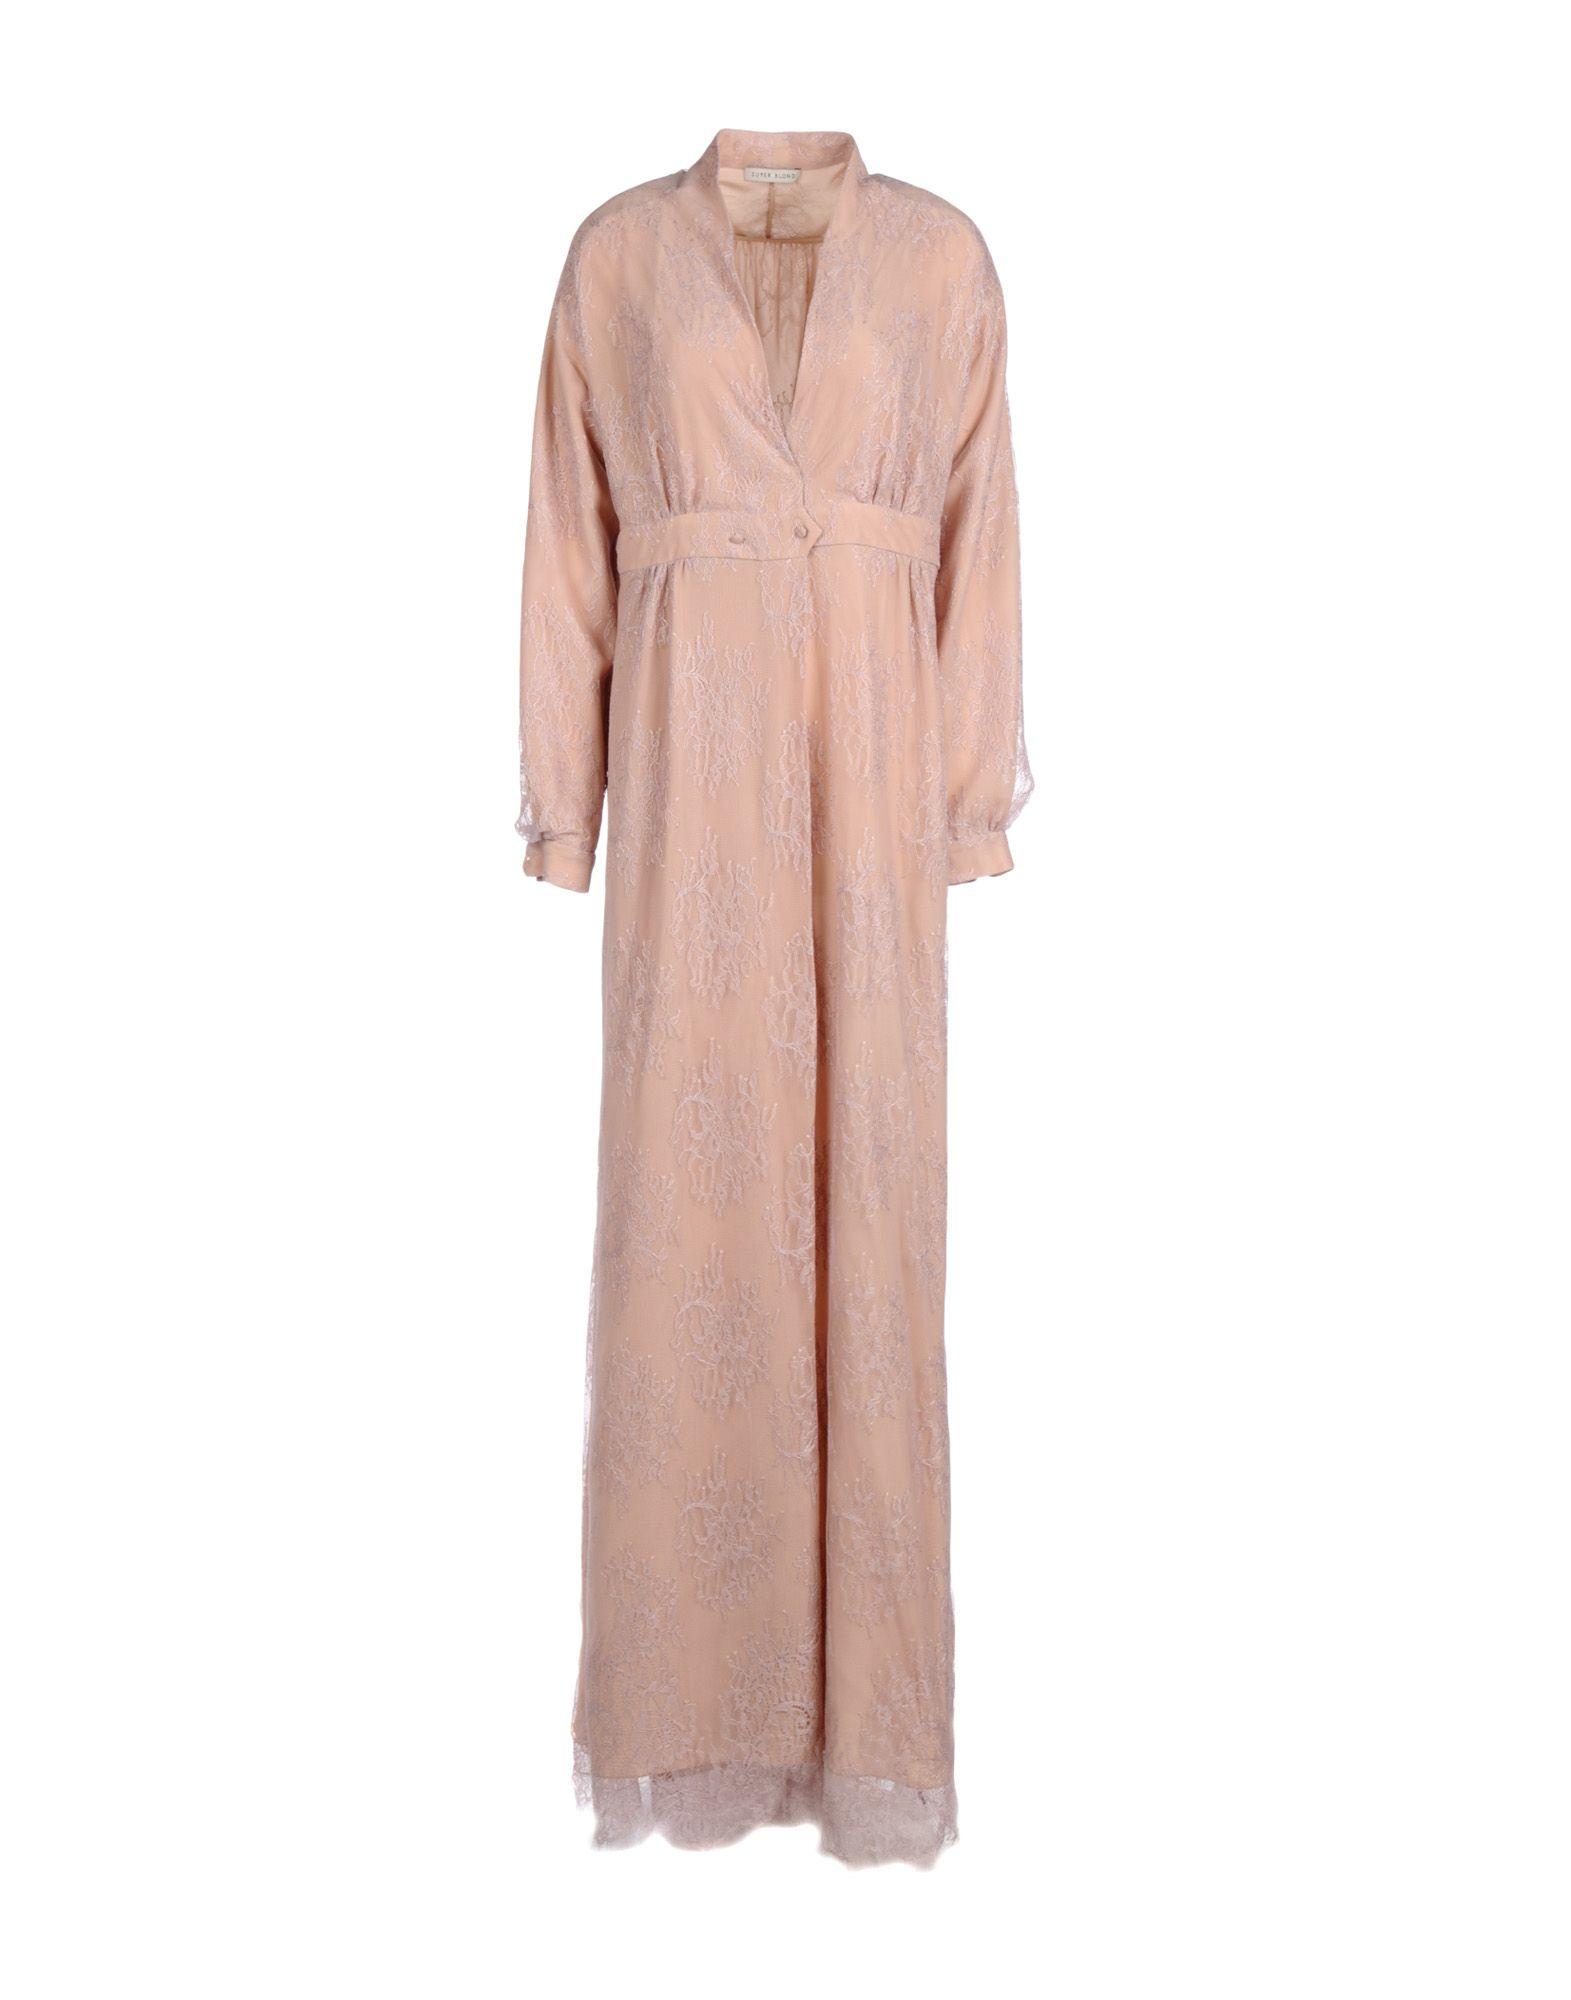 SUPER BLOND Damen Langes Kleid Farbe Nude Größe 5